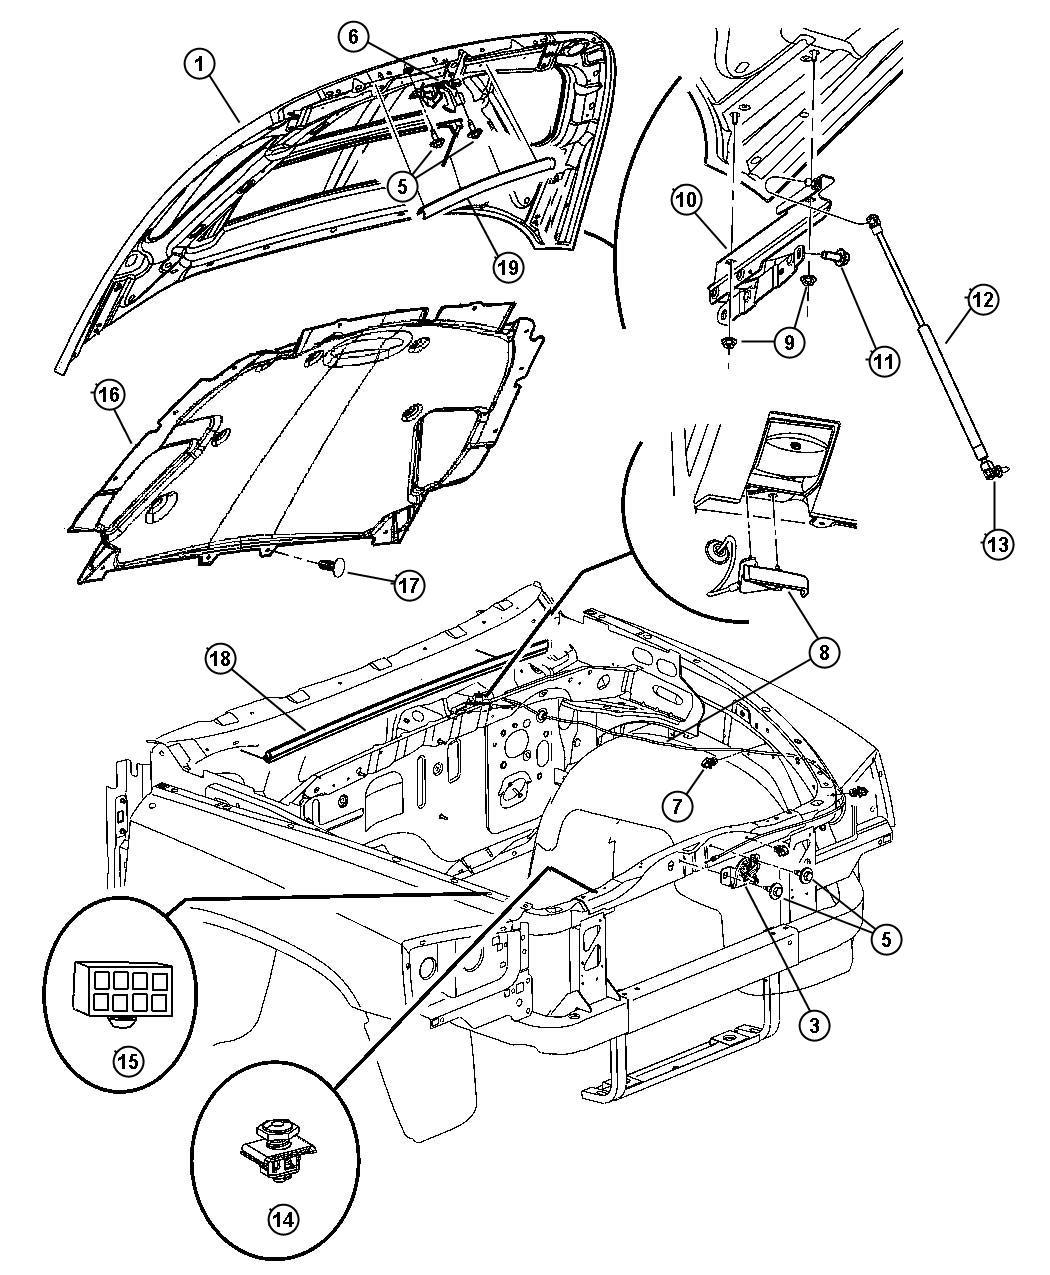 diagram] 2003 dodge dakota hood release diagram full version hd quality release  diagram - 1ghistorywiring.hynco.it  hynco